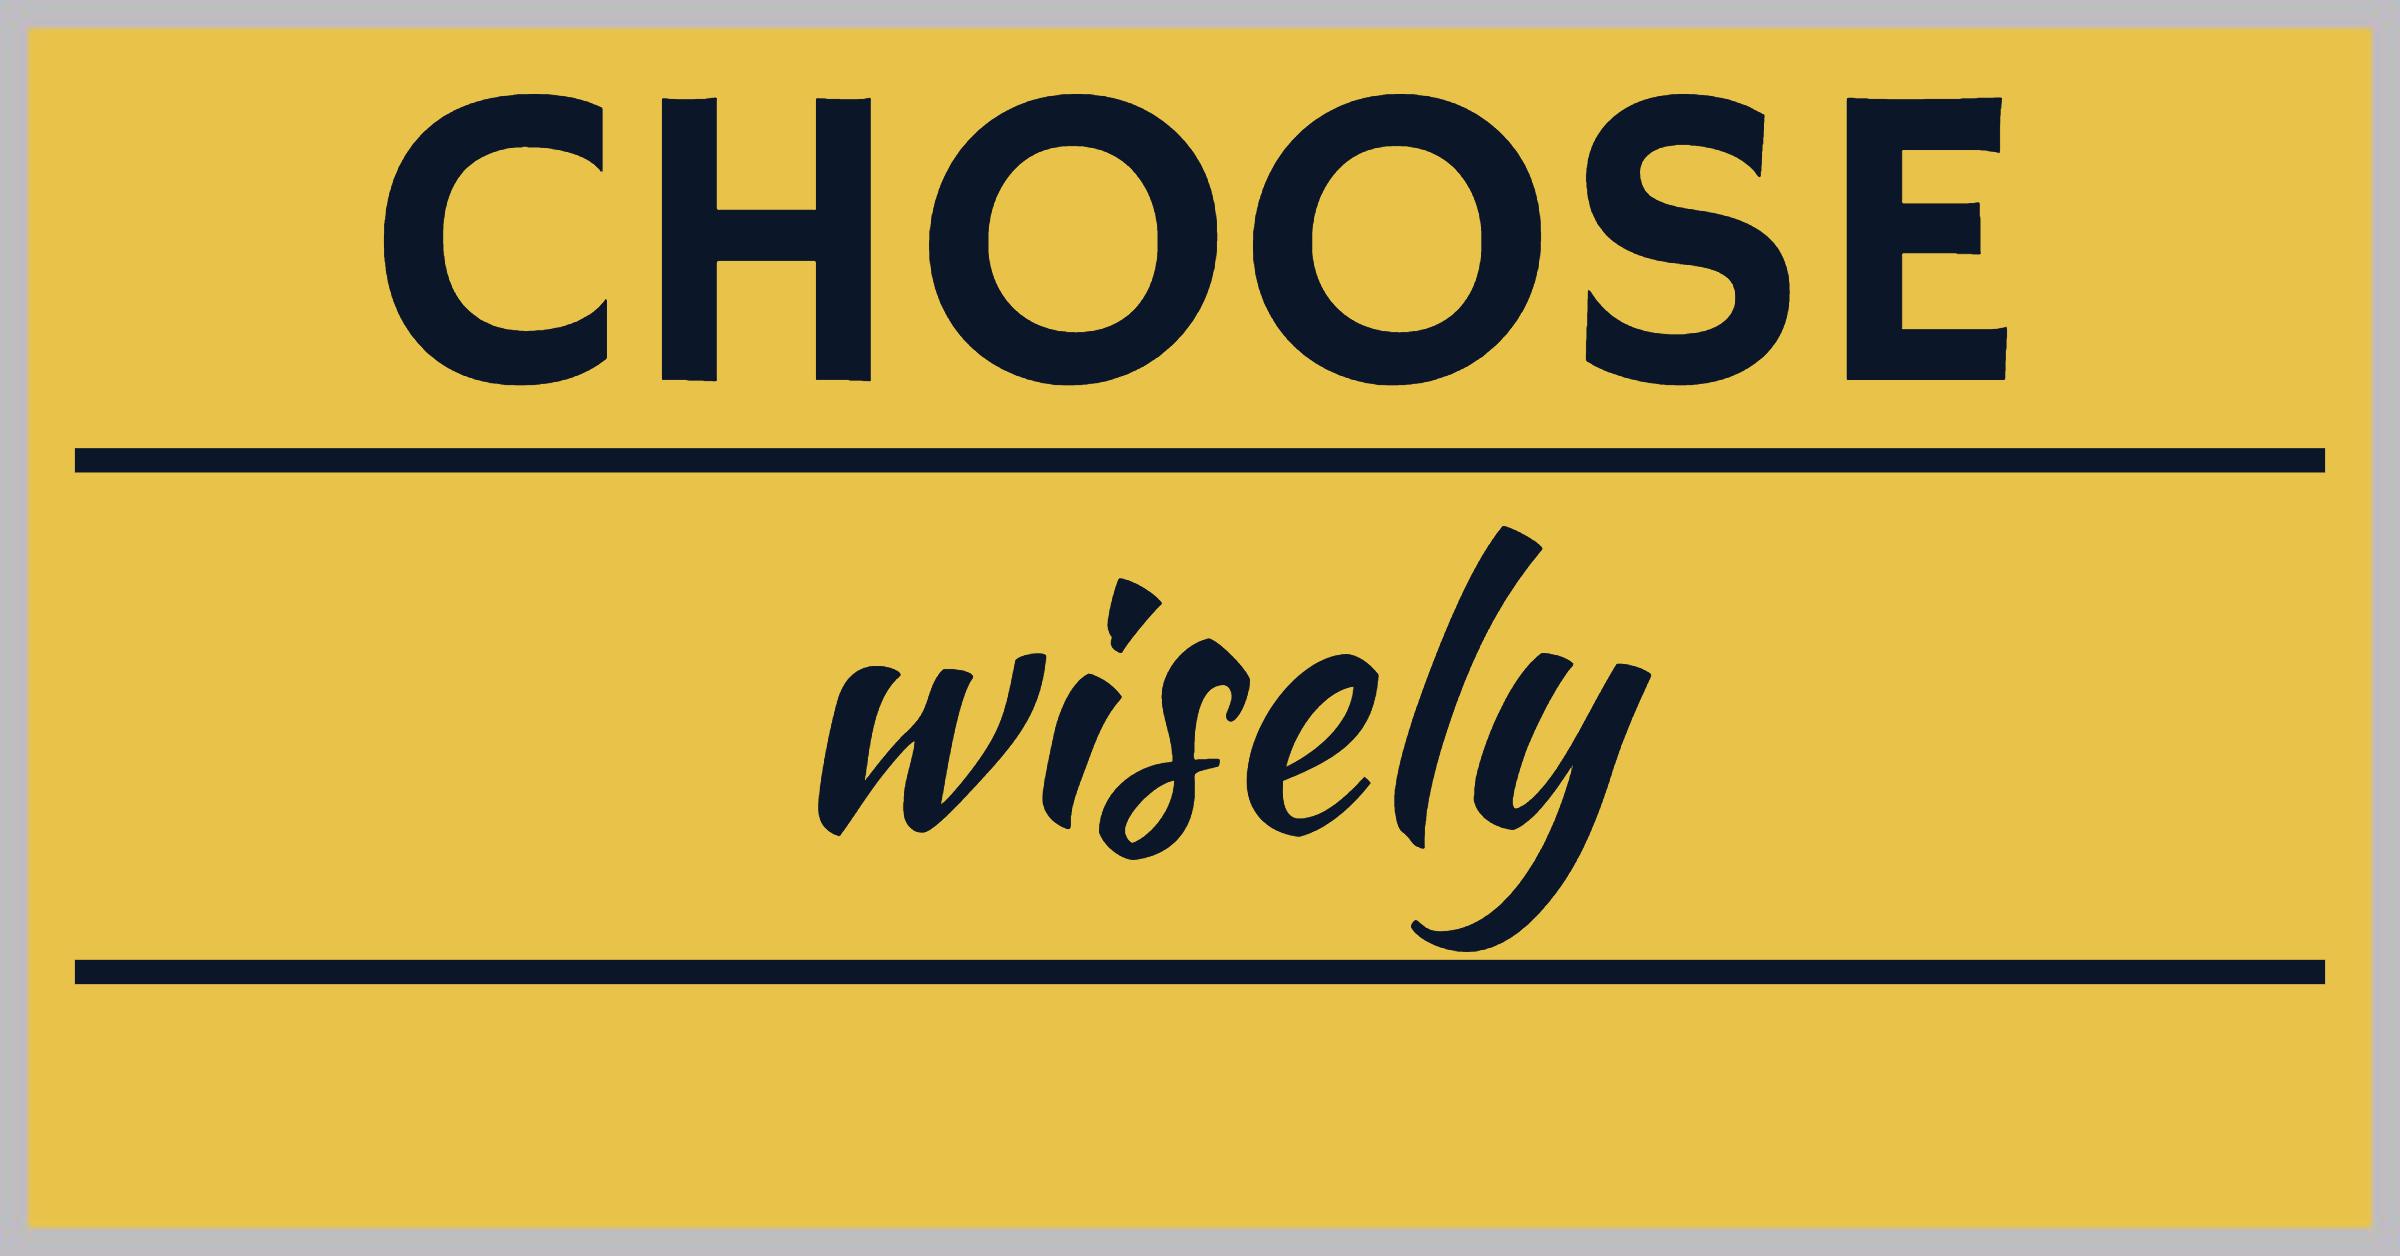 Choose Health - ICA Agency Alliance, Inc.